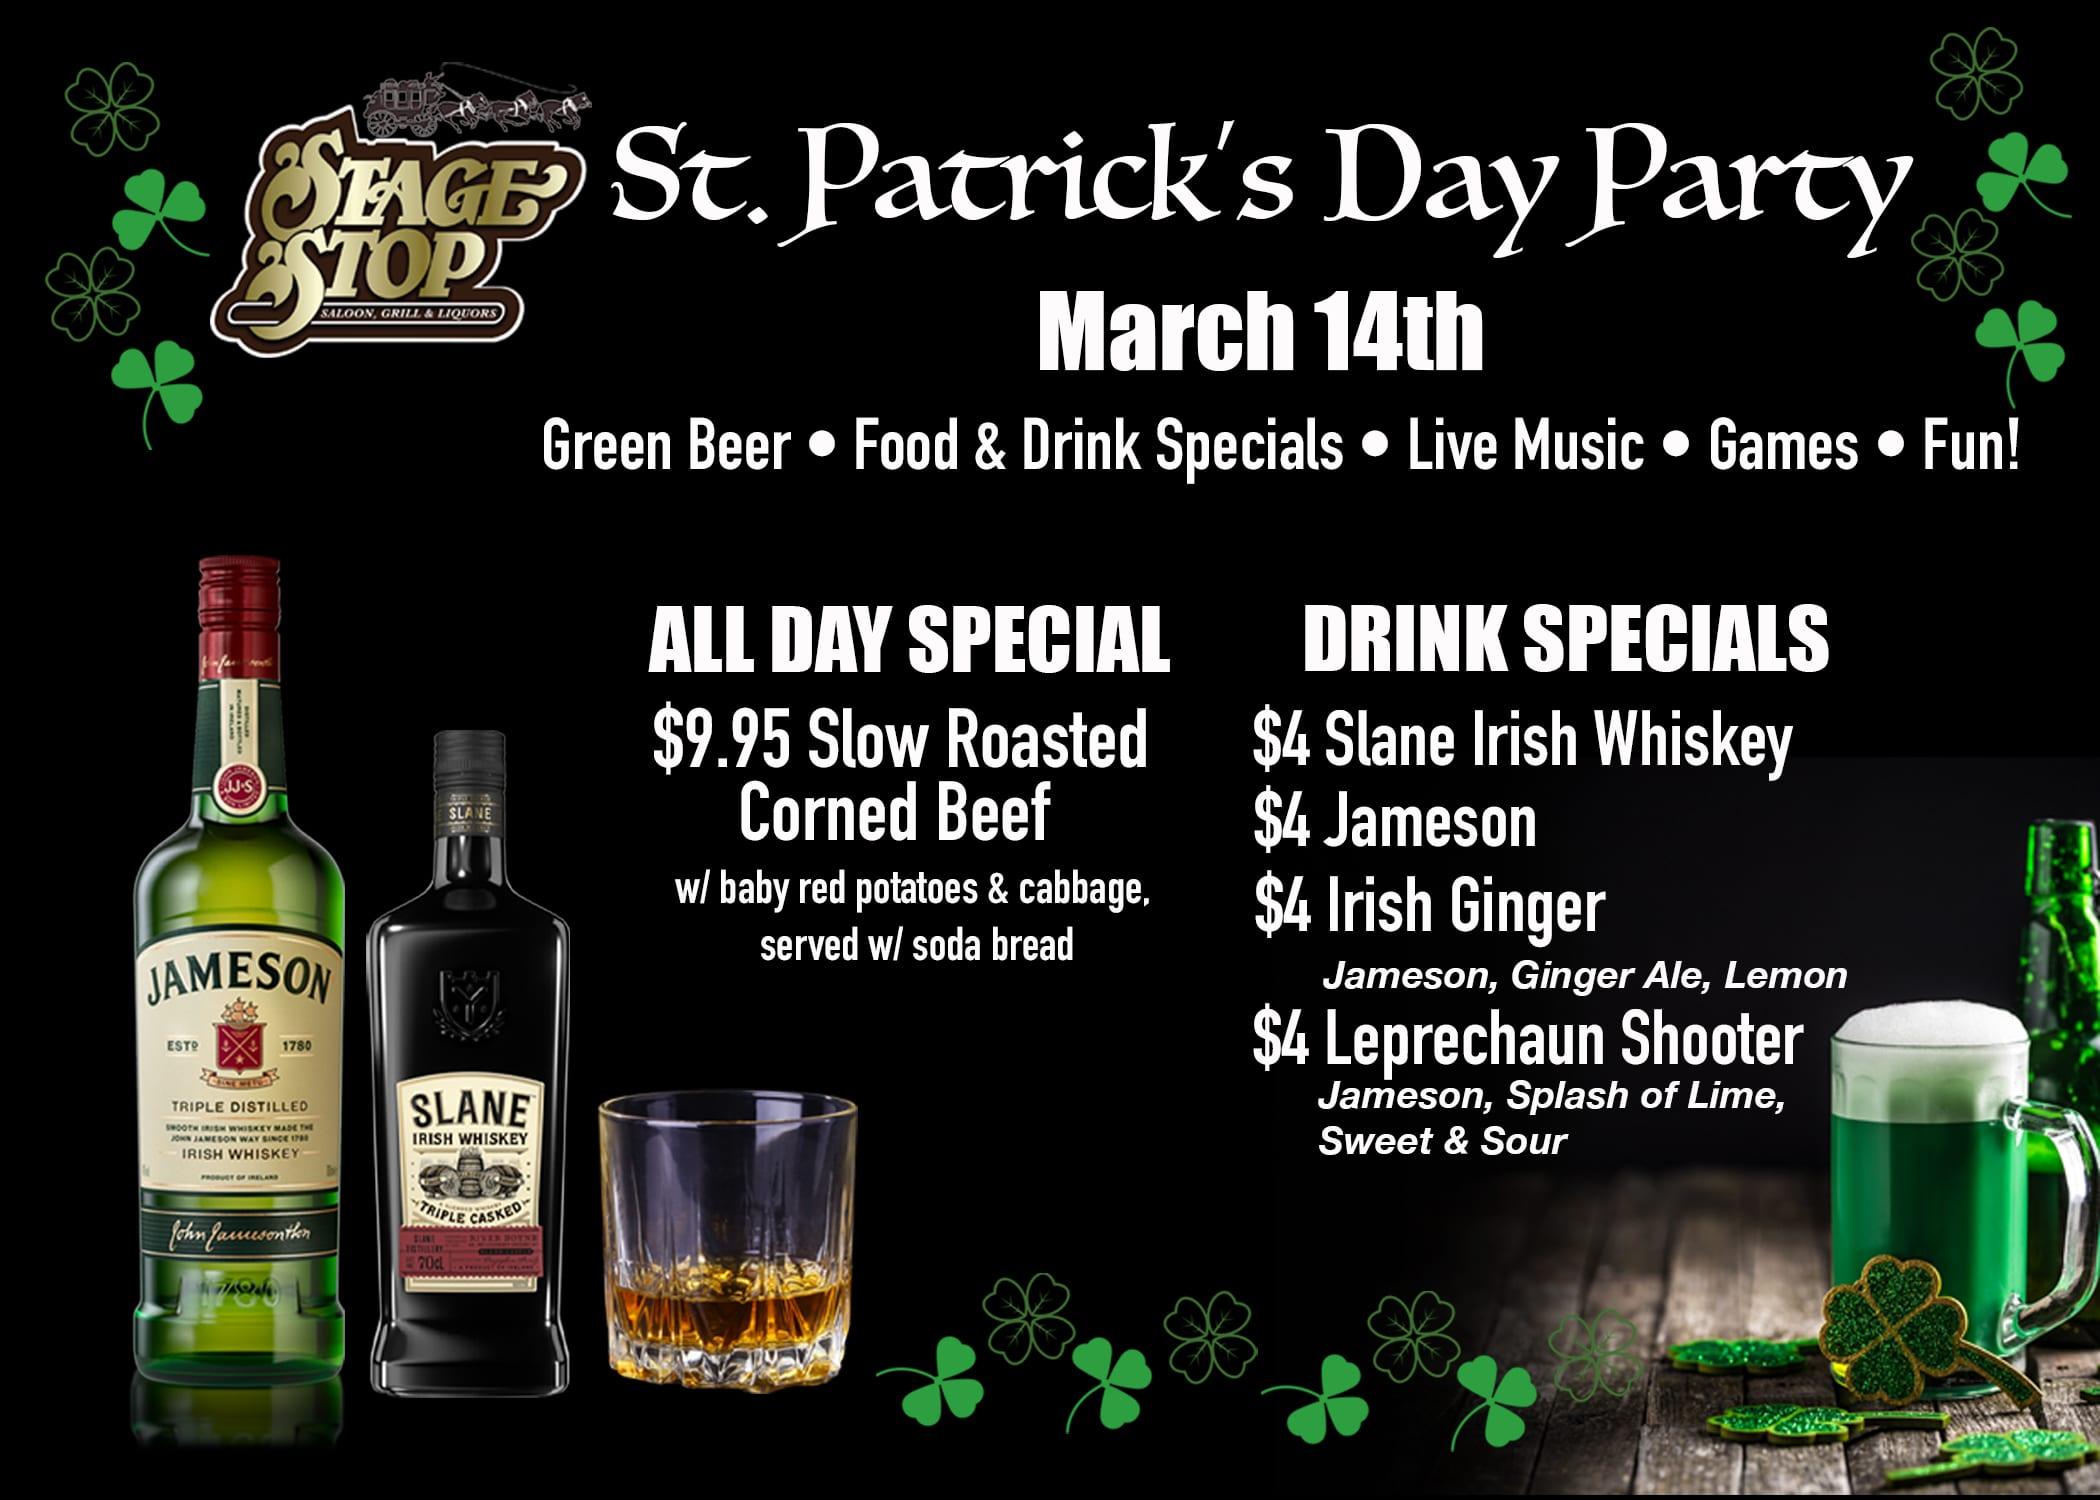 St. Patrick's Day Specials Mandan